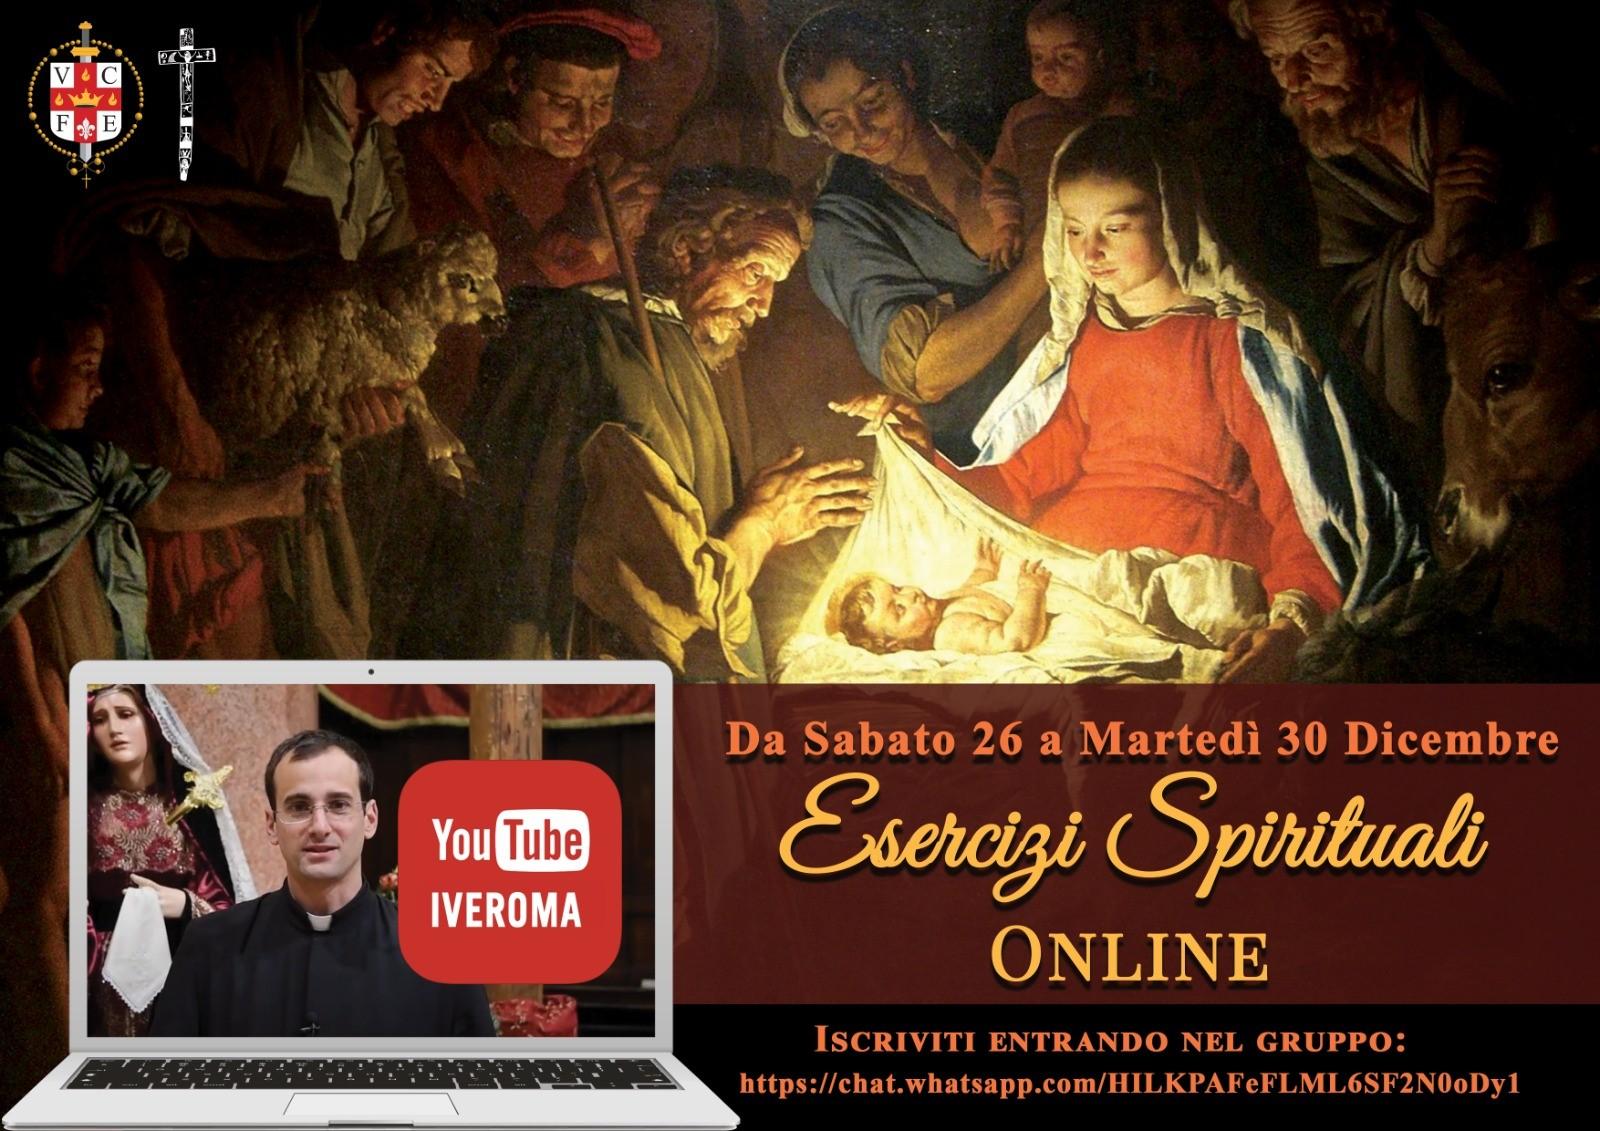 Italia - Ejercicios Espirituales Online